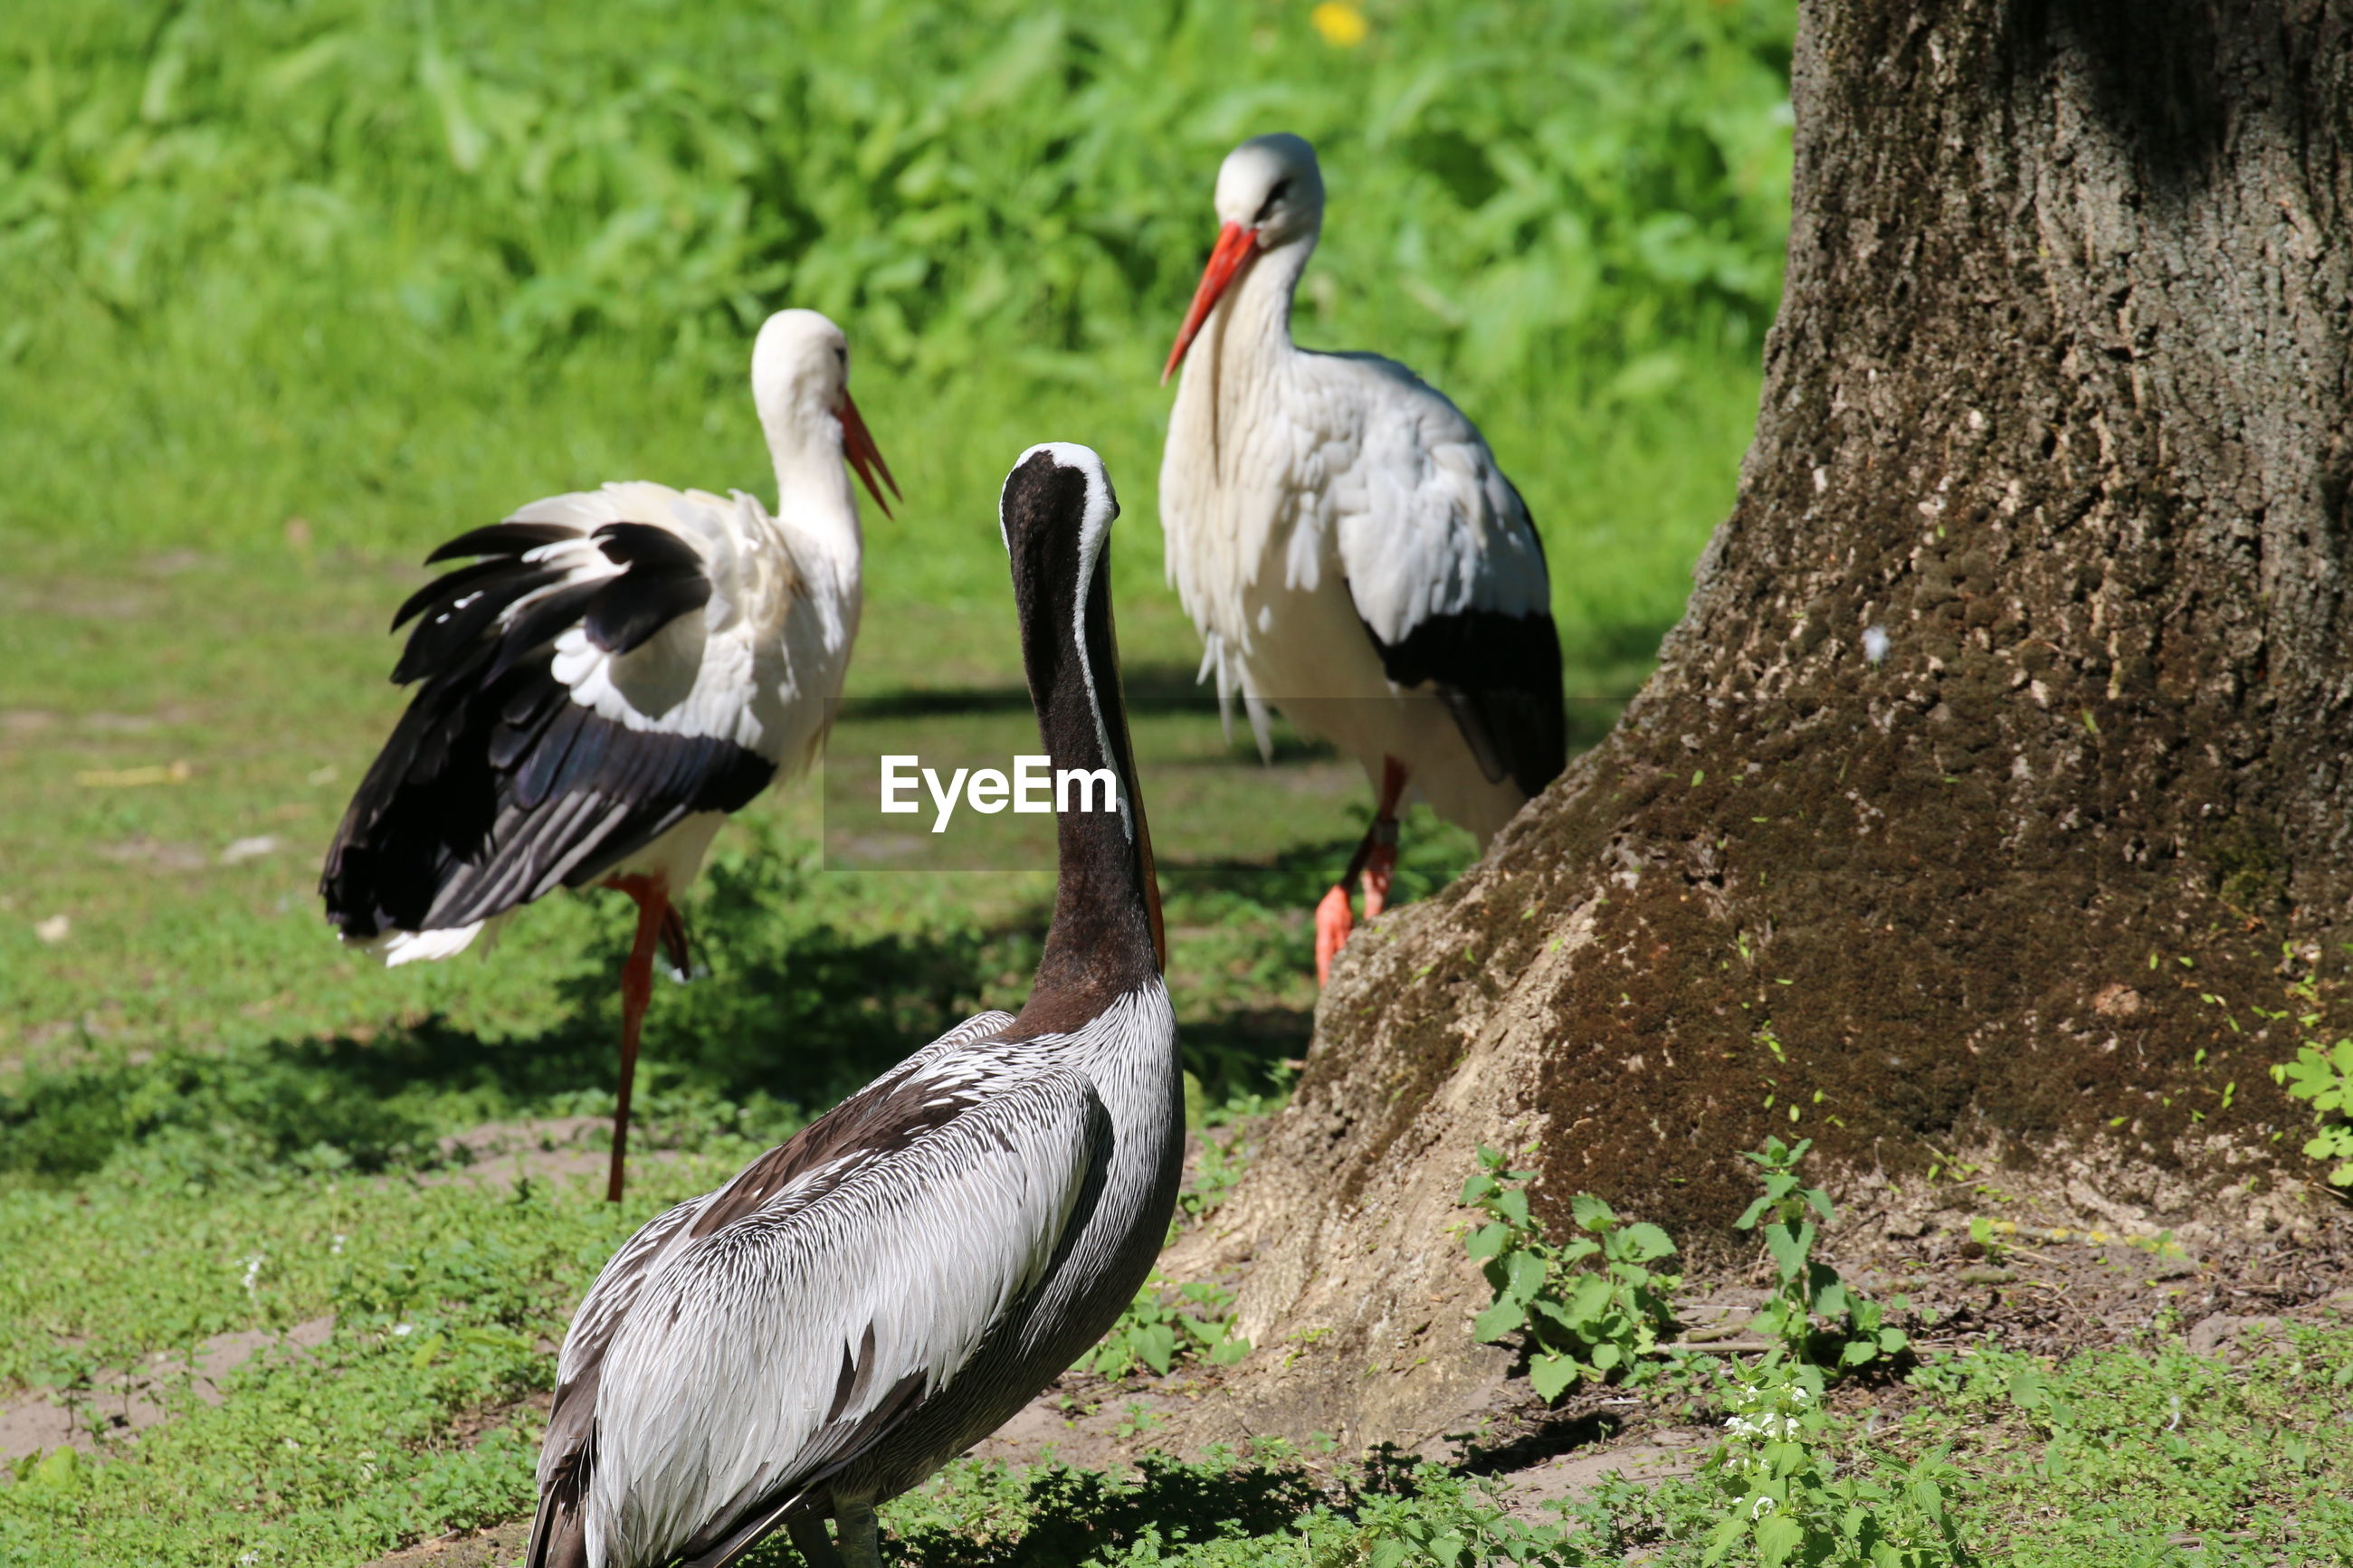 Flock of birds perching on grass